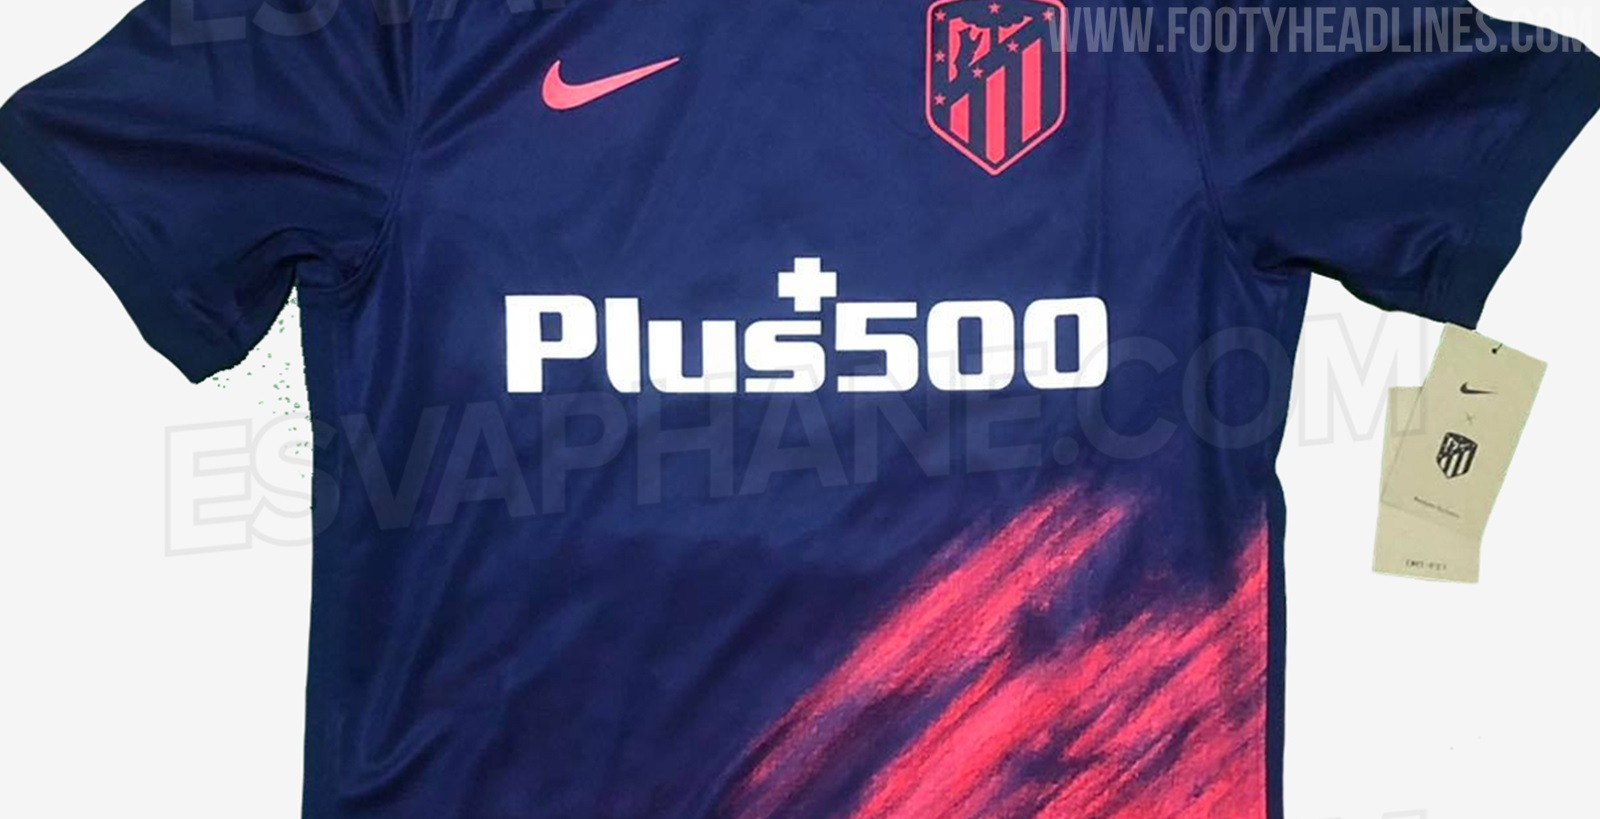 Atletico Madrid 21 22 Away Kit Leaked